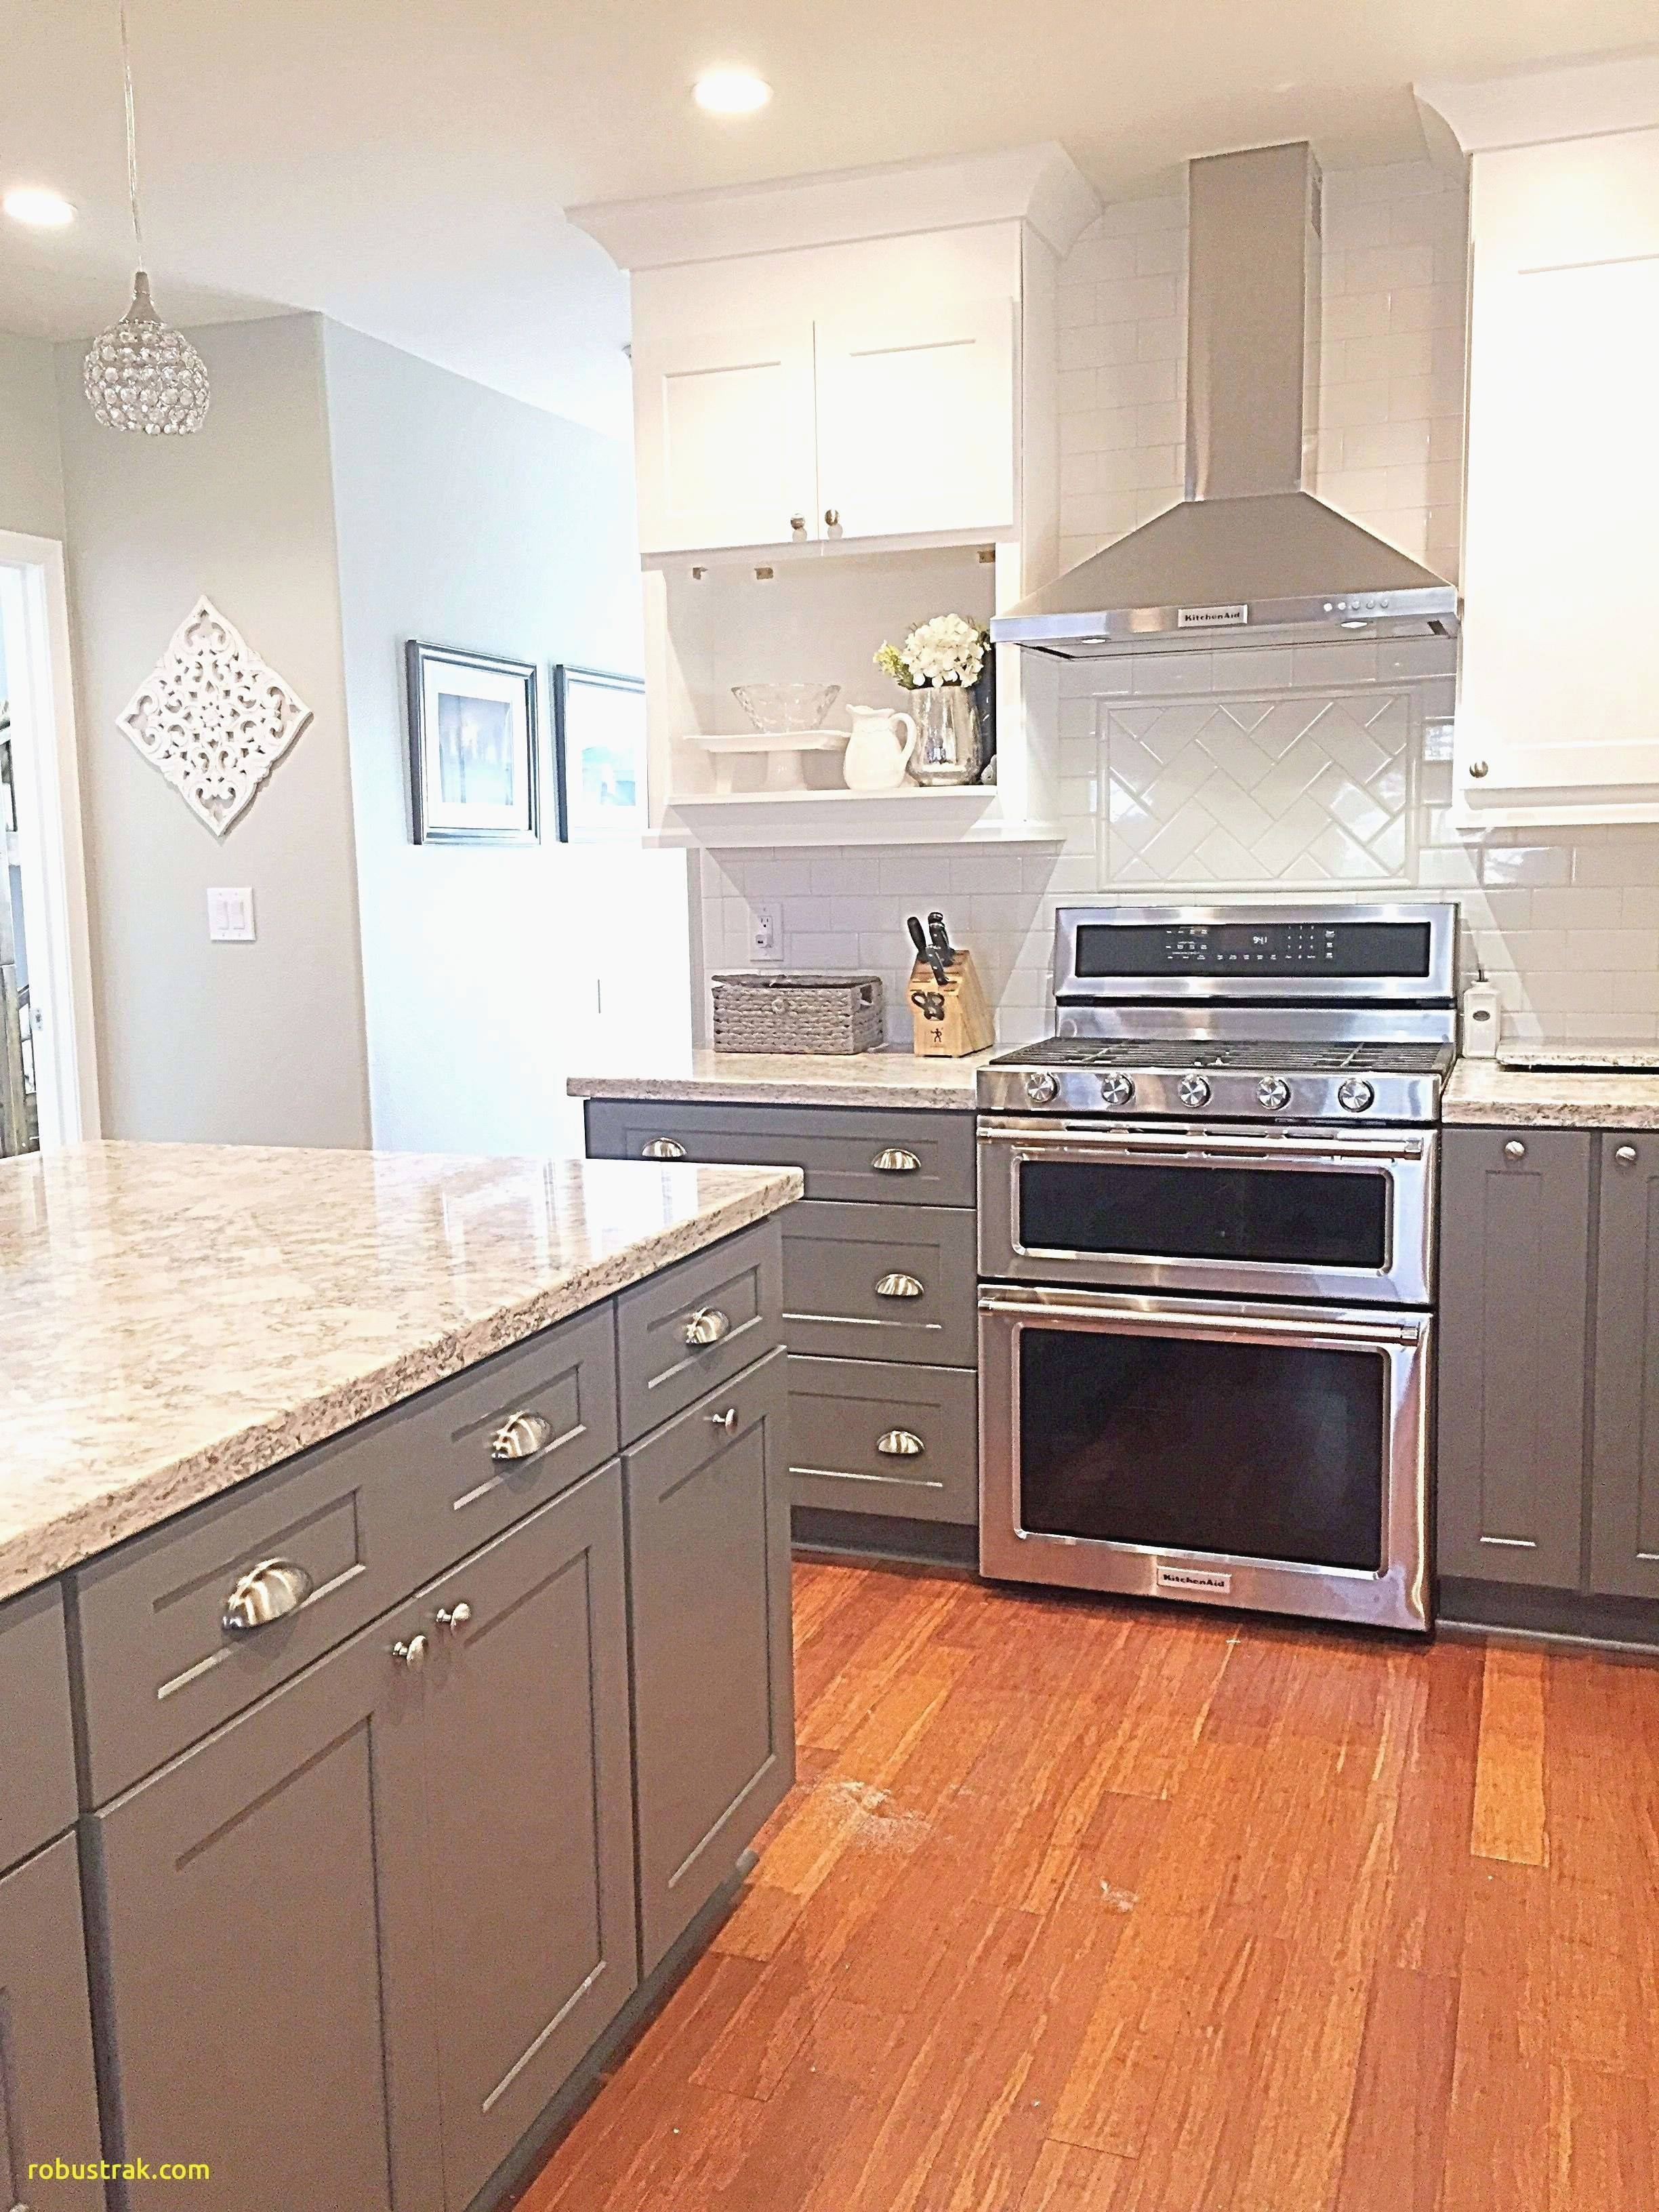 hardwood floor kitchen cabinet binations of noticeable kitchen cabinet stain colors on oak above kitchen decor with kitchen colors with dark cabinets best colored kitchen cabinets lovely